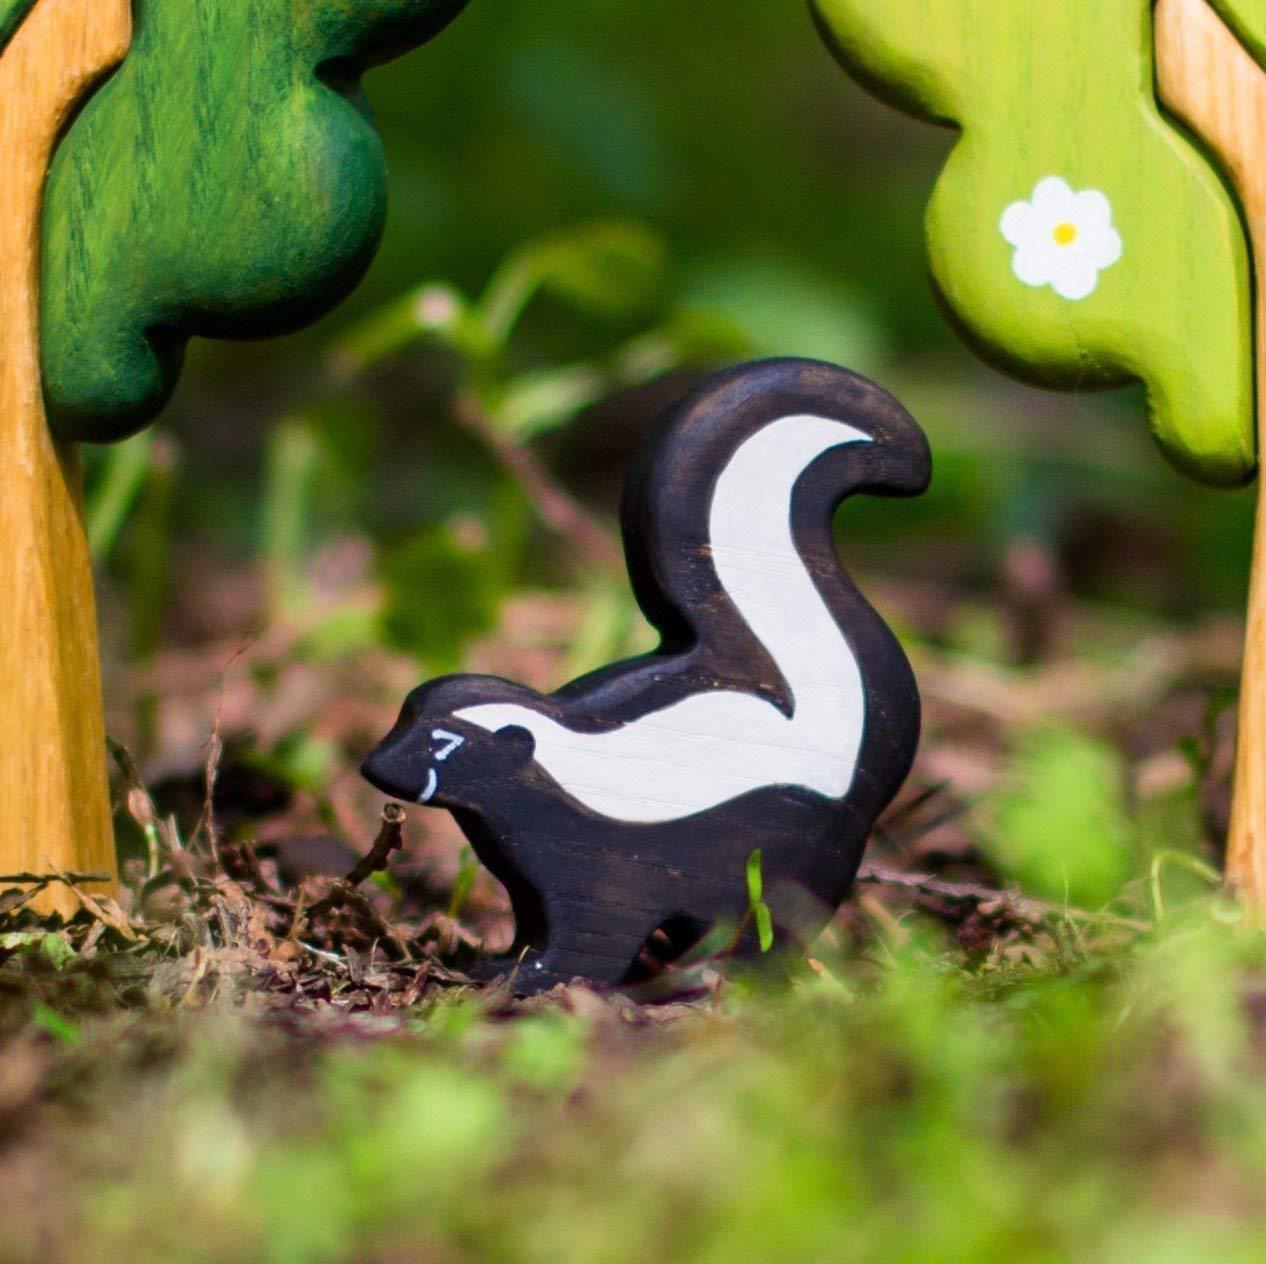 Handmade Wood Toy Animal Skunk